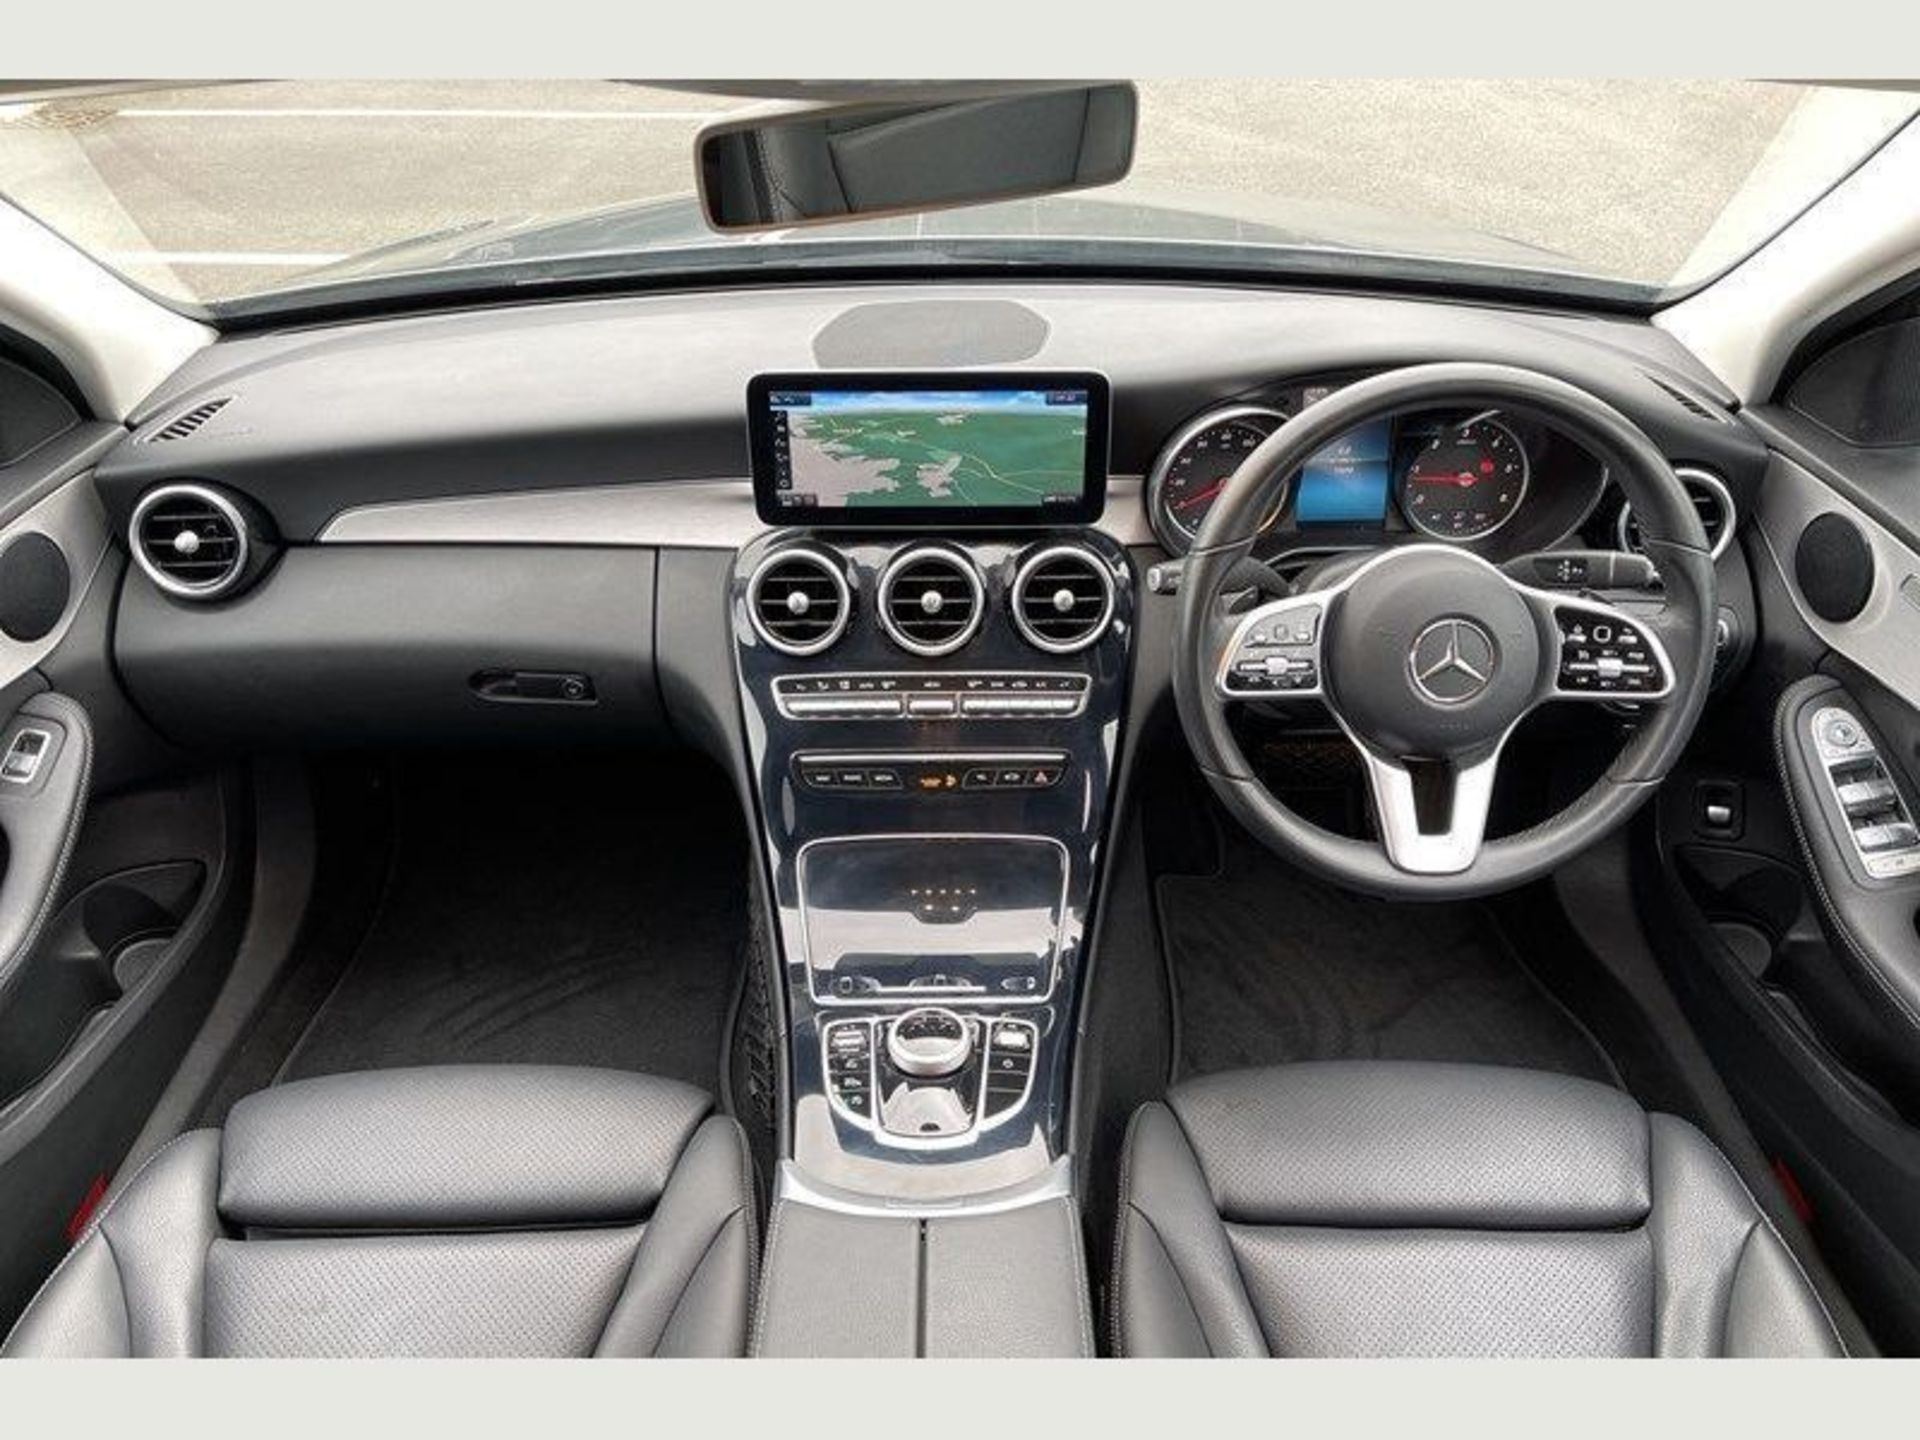 (Reserve Met) Mercedes C220d Sport - 9G Tronic Auto - 188BHP - 2019 Reg - Reversing Cam - Sat Nav - - Image 5 of 7